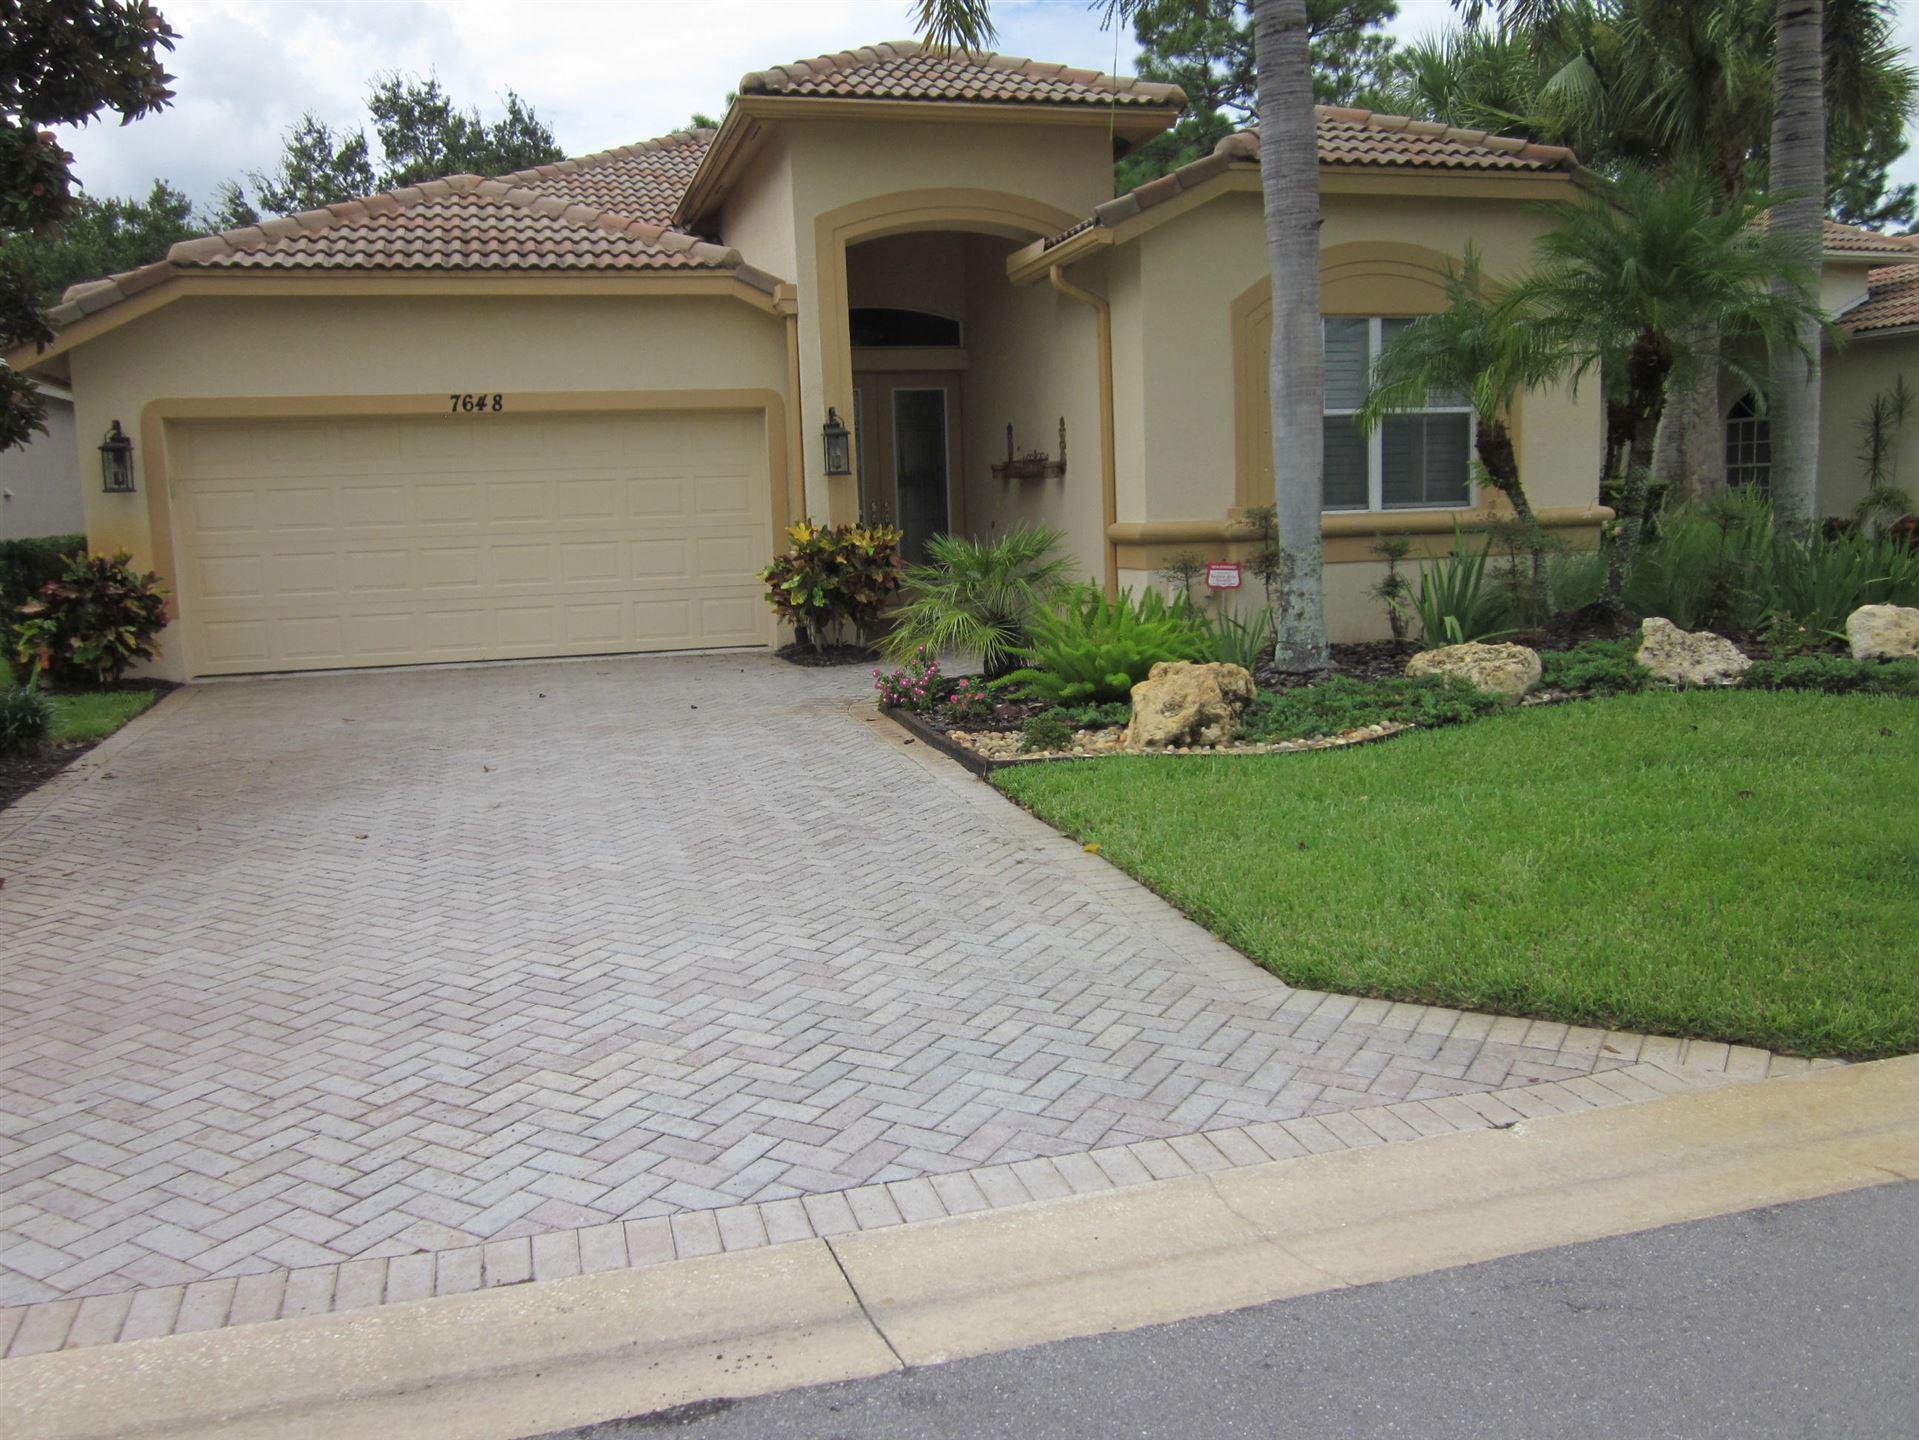 7648 Greenbrier Circle, Port Saint Lucie, FL 34986 - #: RX-10608407